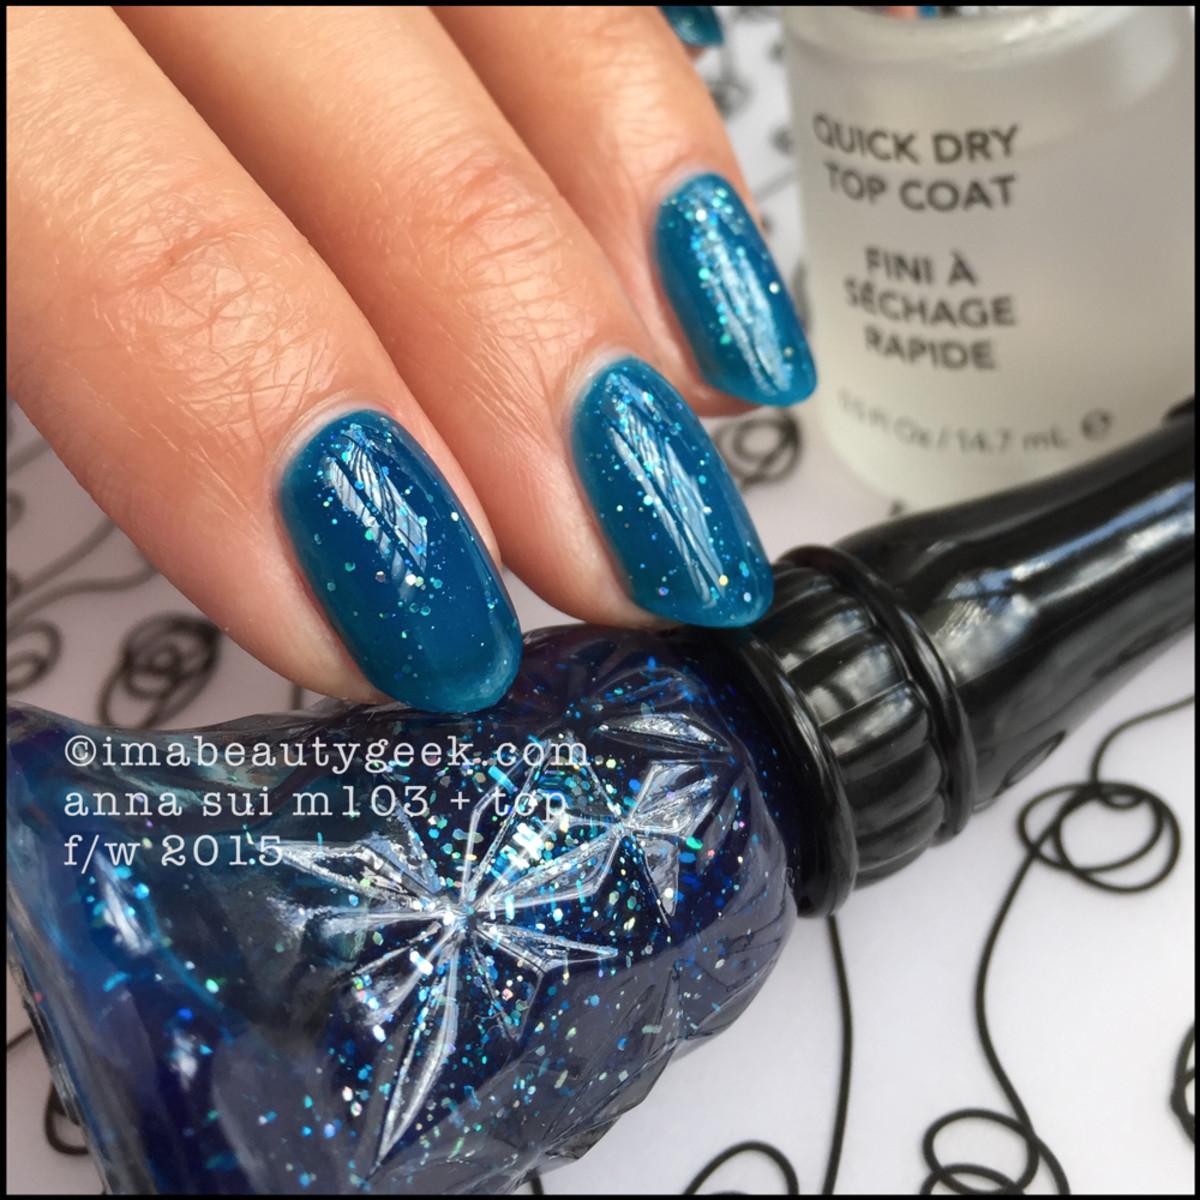 Anna Sui Nail Polish M103 w Top Coat_Anna Sui Nail Color M103